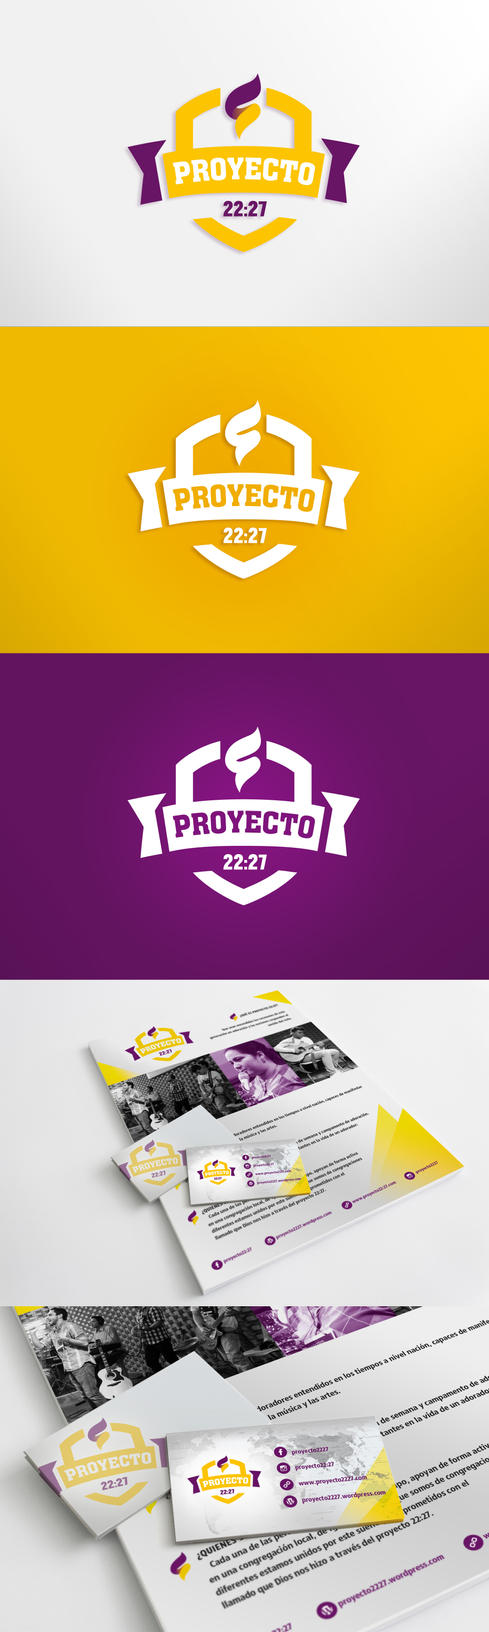 All Pro - Proyecto 22 27 2 by lita-lita